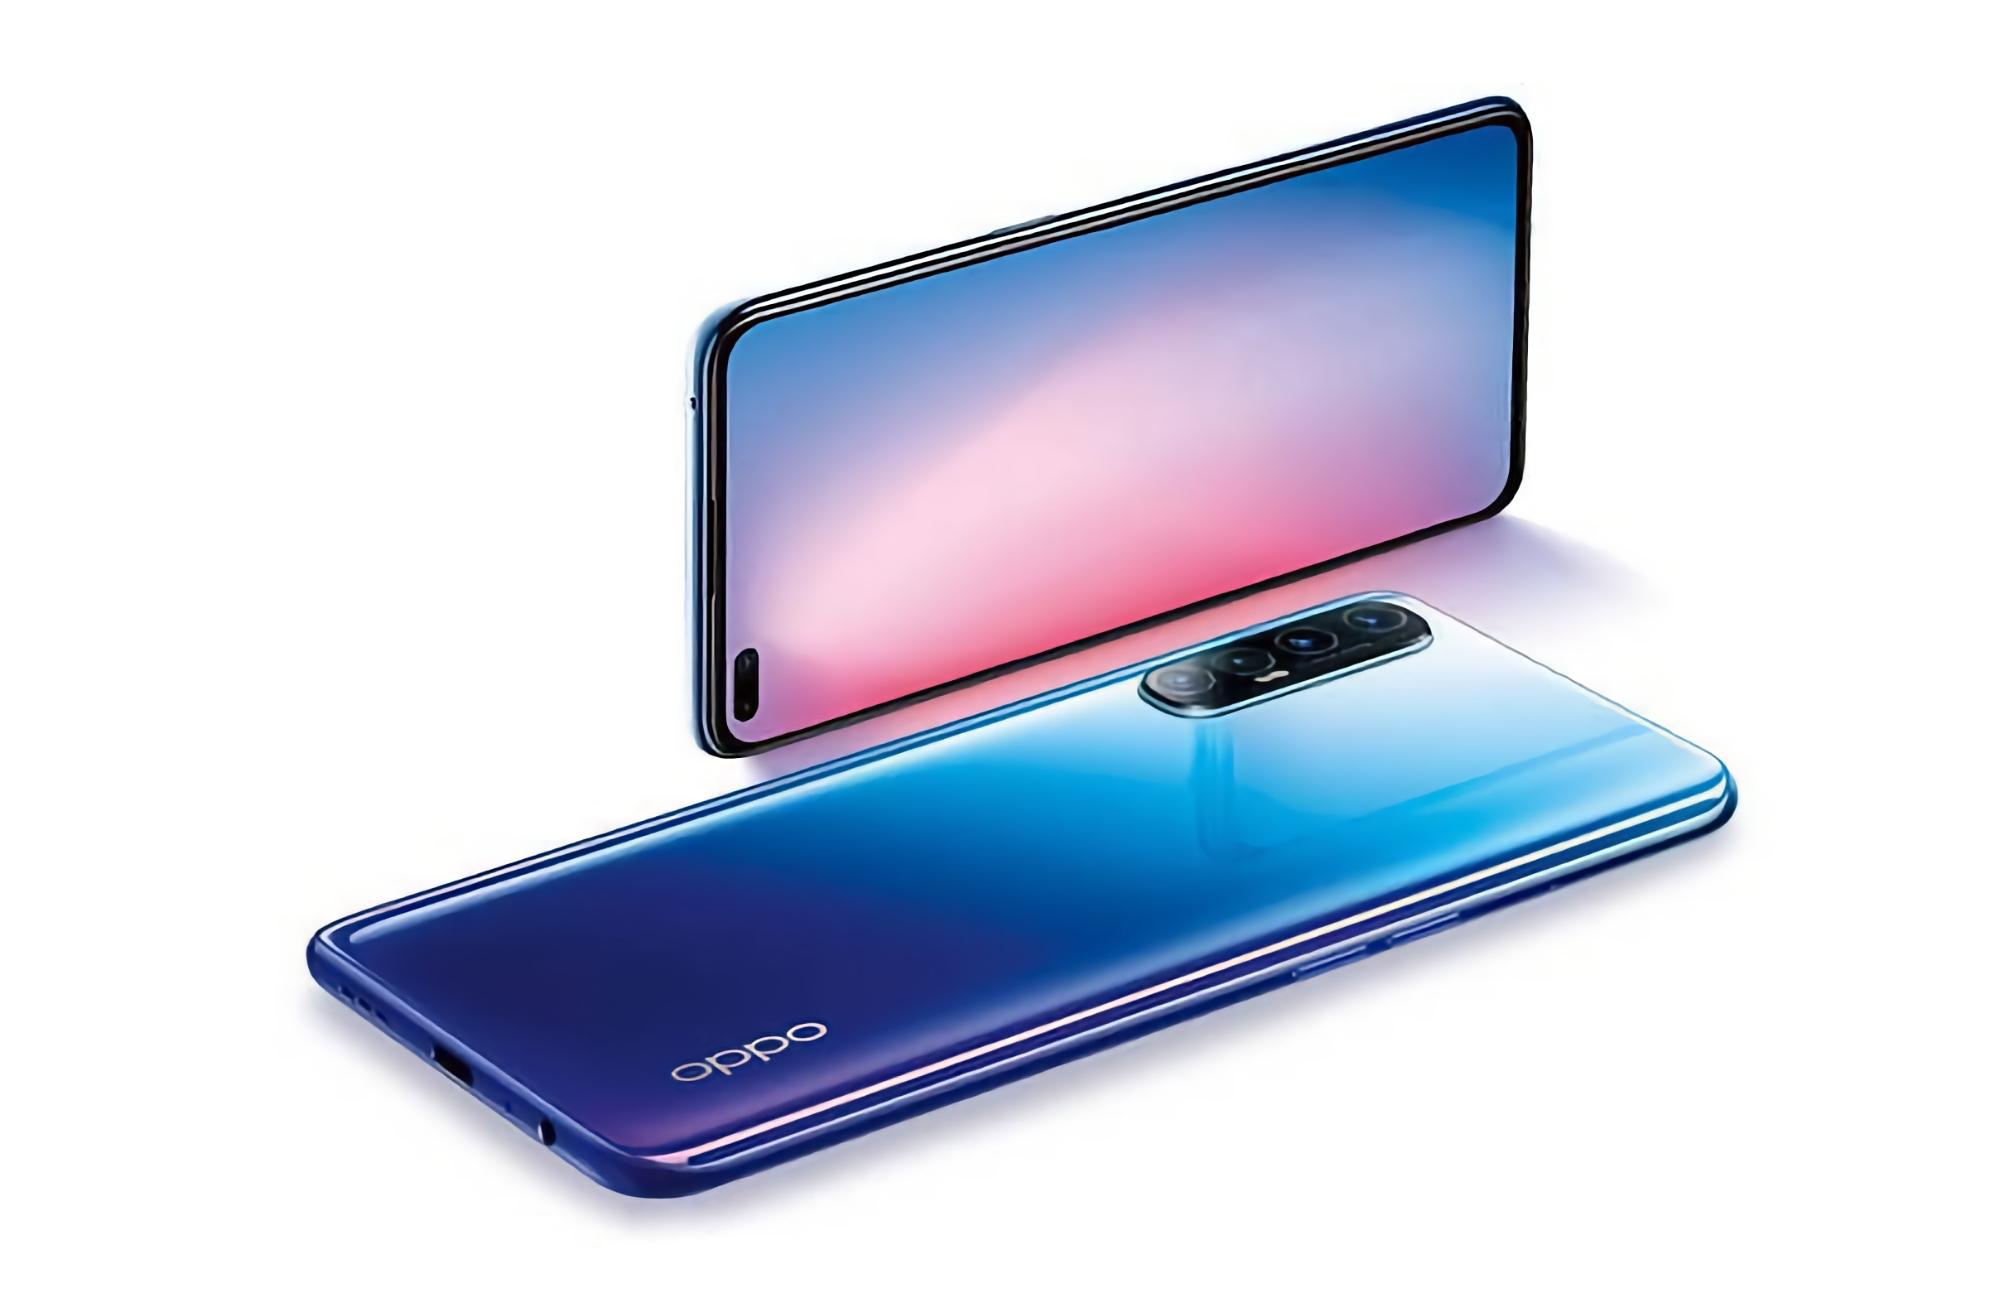 Официально: OPPO Reno 3 4G, OPPO Reno 3 Pro 4G и OPPO A72 получат обновление ColorOS 11 с Android 11 в этом месяце